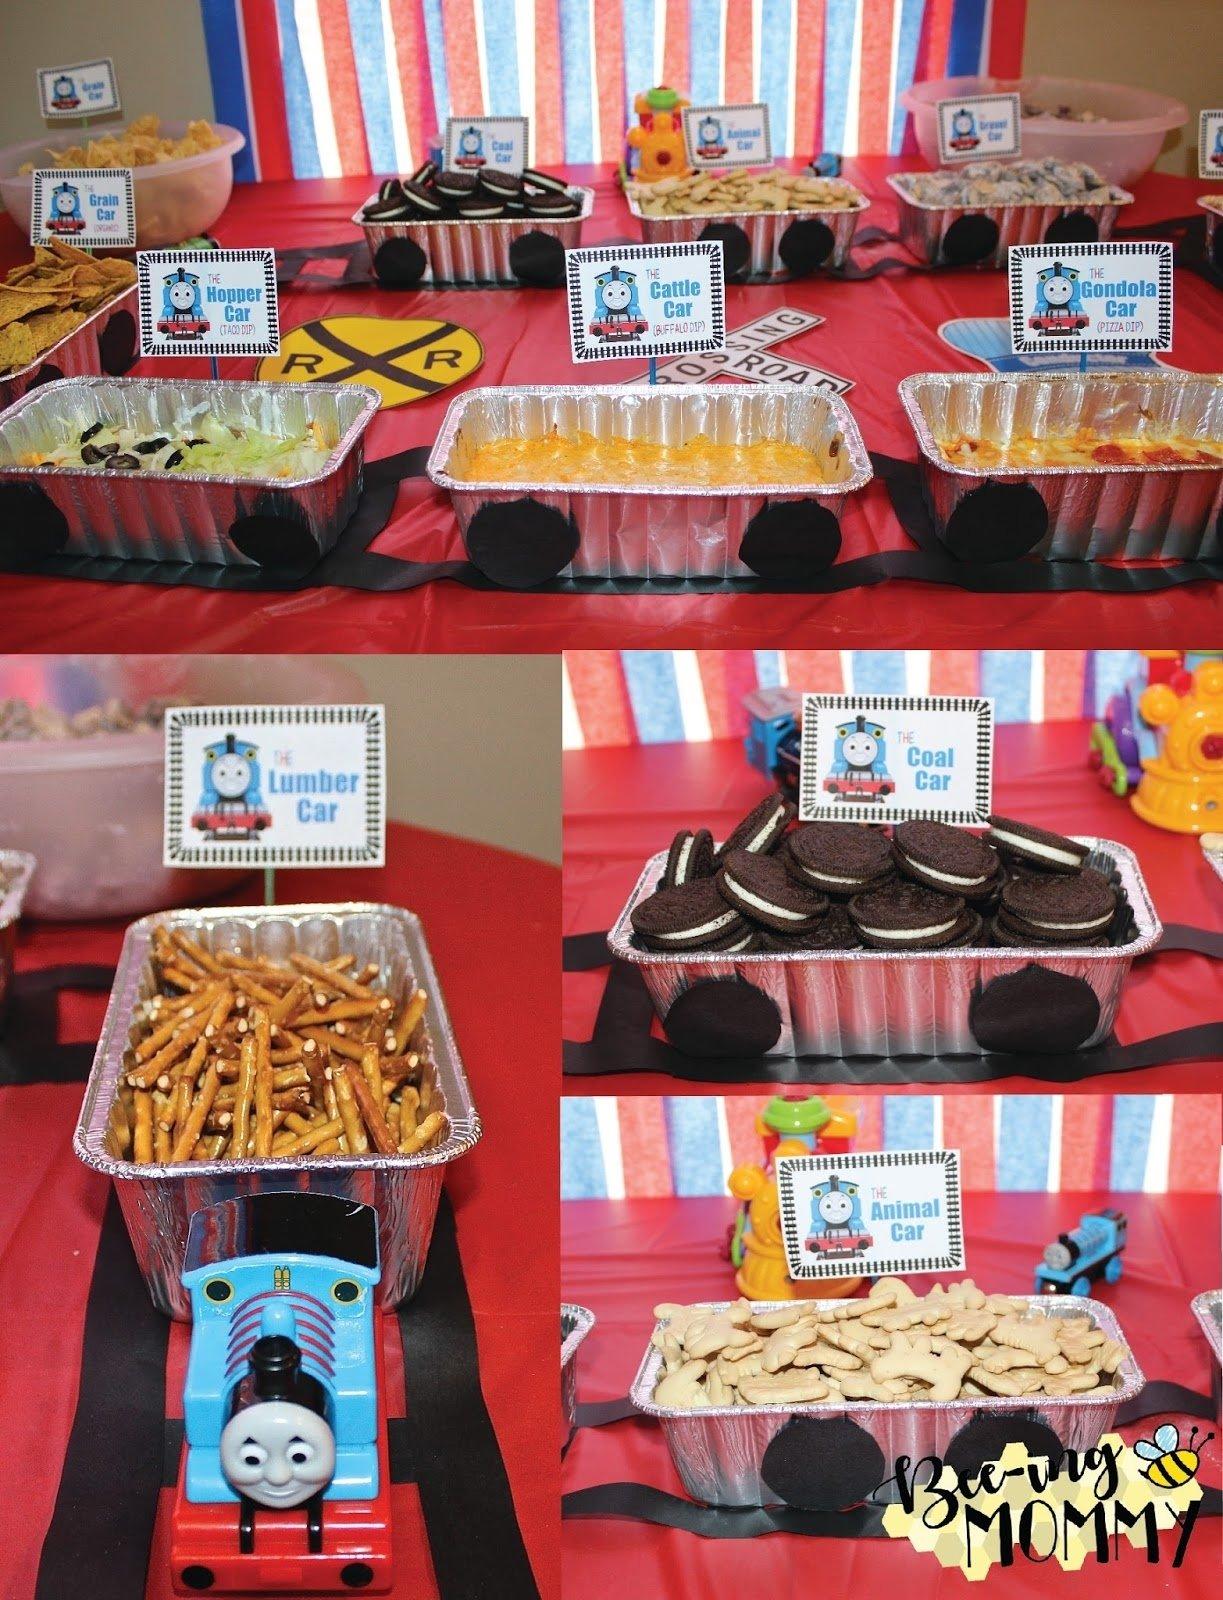 10 Fabulous Thomas The Train Party Food Ideas bee ing mommy blog thomas the train birthday party chugga chugga 2021